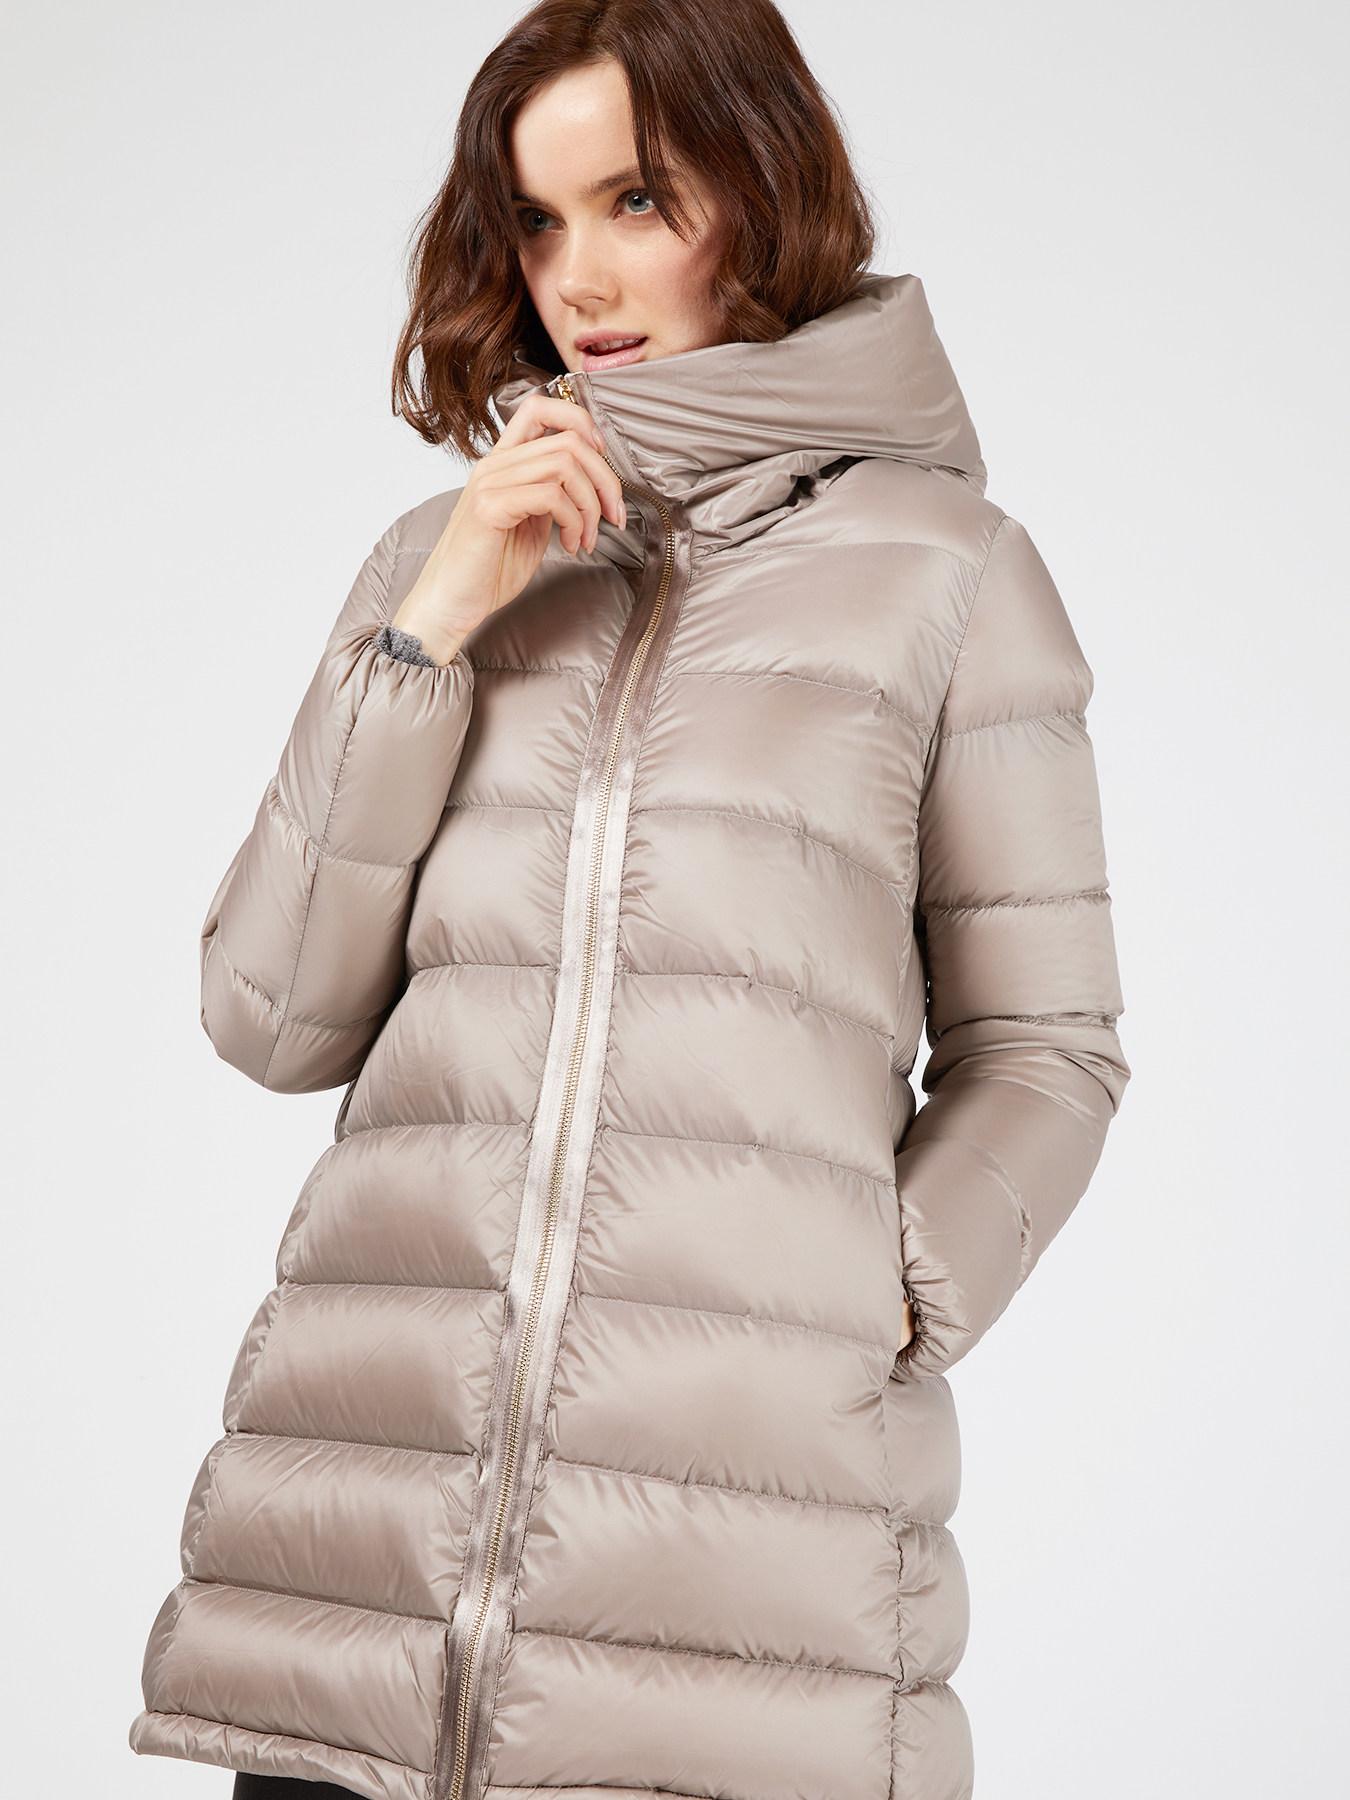 Straight-cut hooded down jacket. - Motivi.com - FR 2ea1d27a85c0